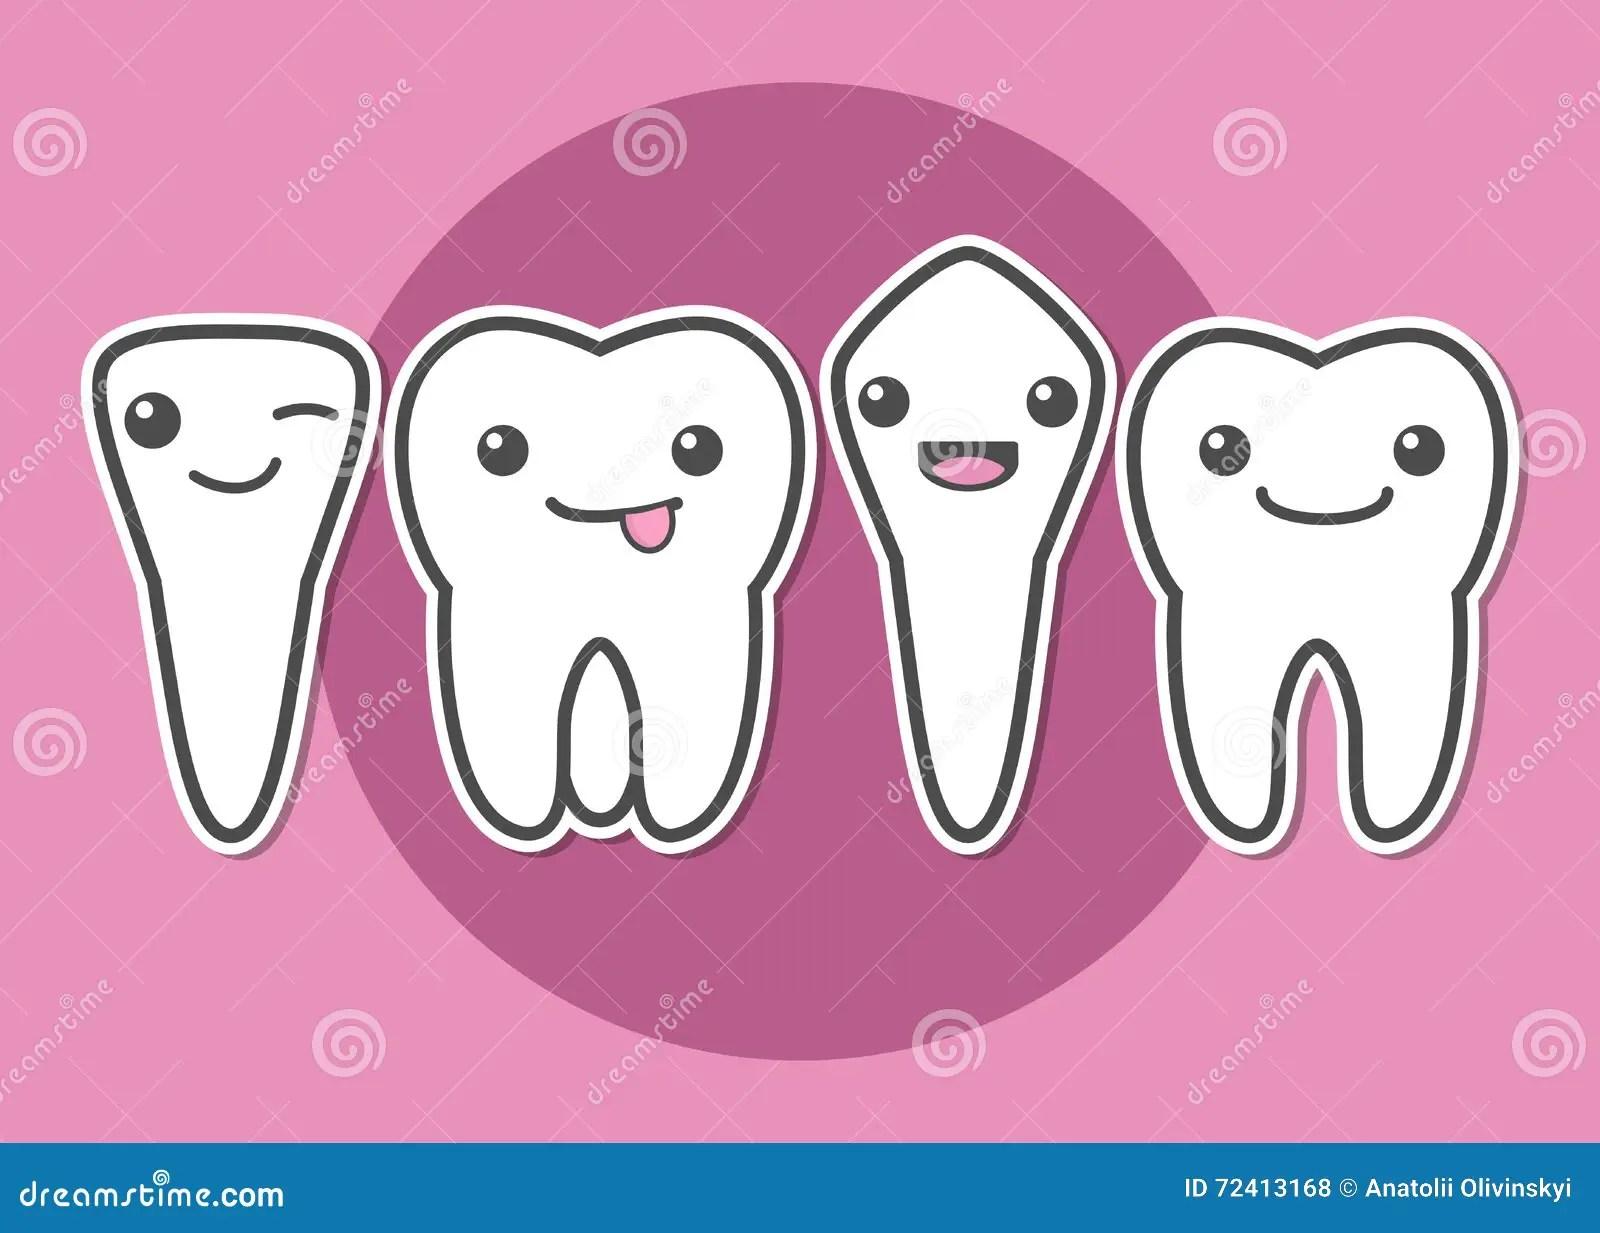 Tooth Types Illustration Stock Illustration Illustration